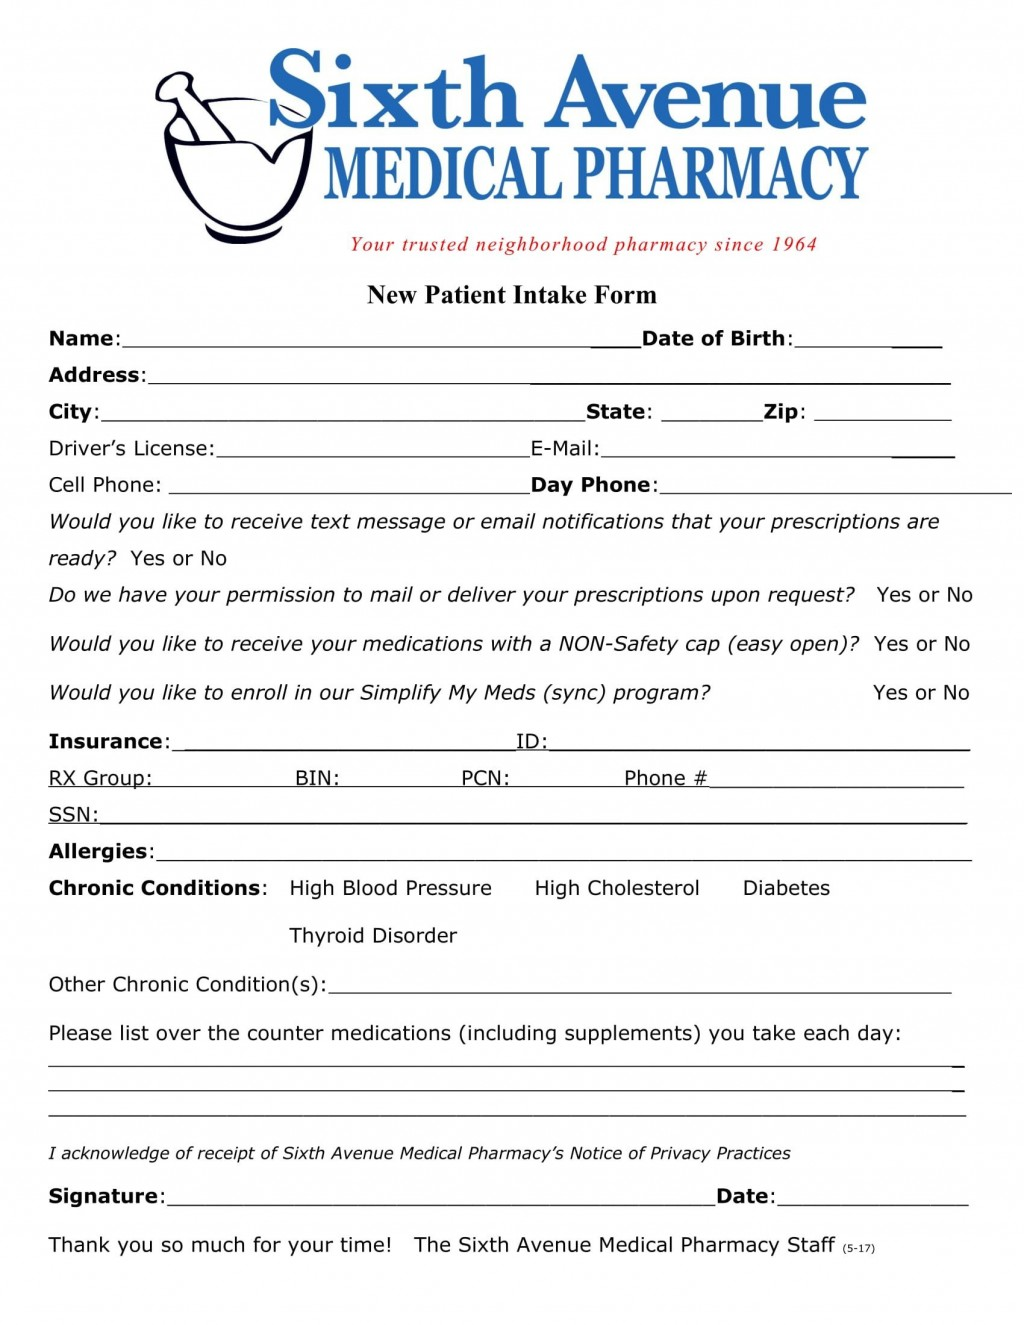 006 Sensational Patient Intake Form Template Photo  Word Client Excel PdfLarge